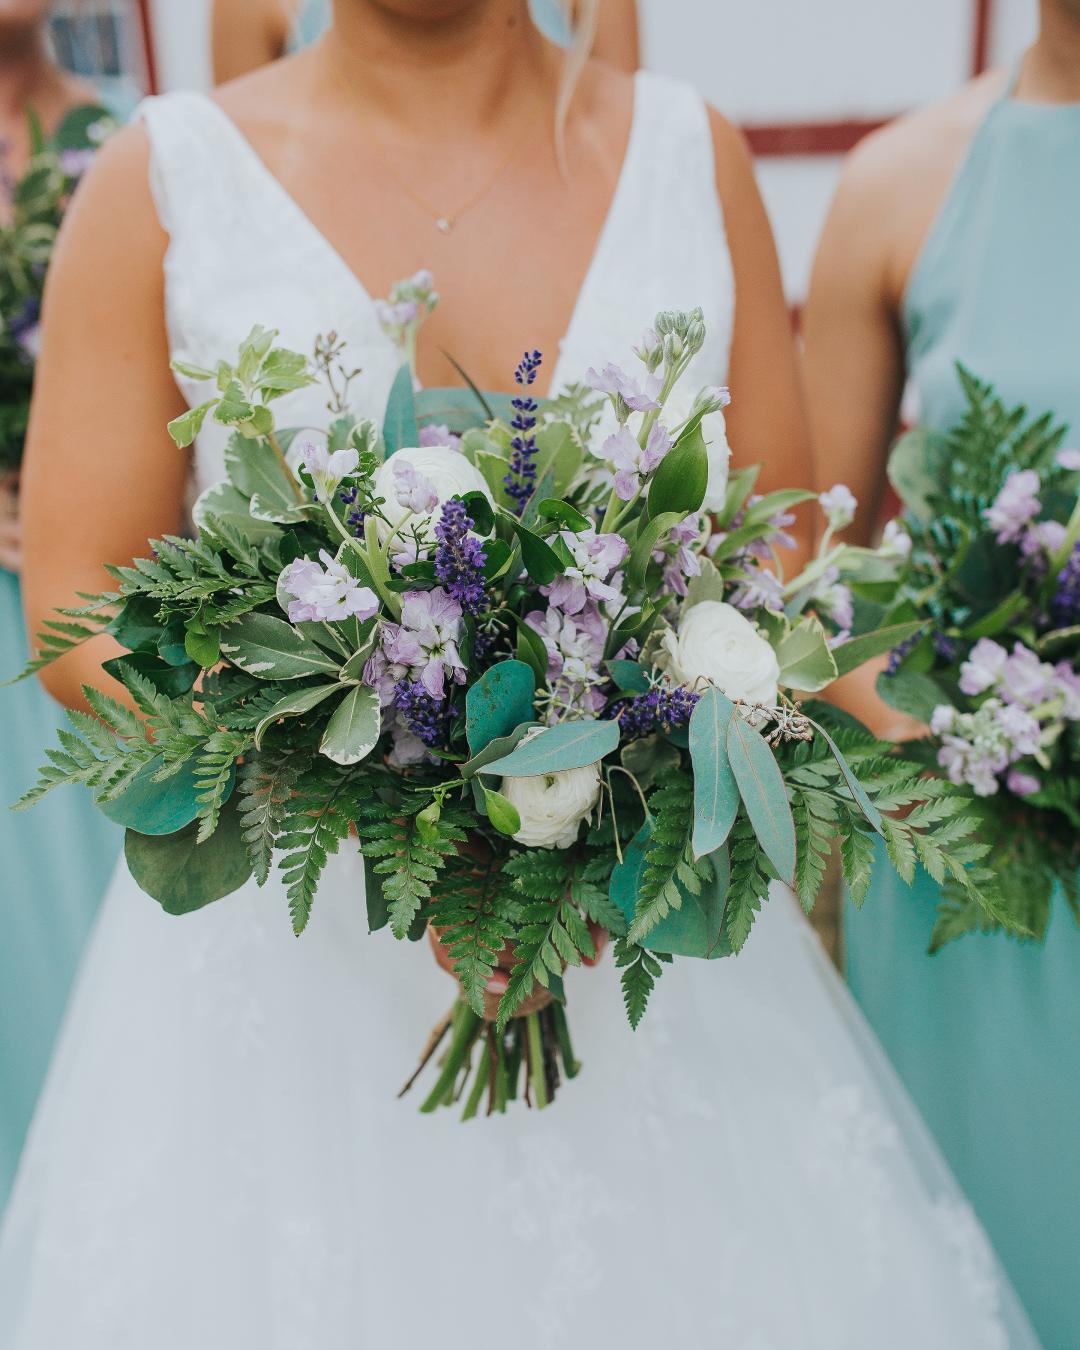 12 Heads Artificial Lavender Flower Leaves Bouquet Home Garden Wedding Decor Ff